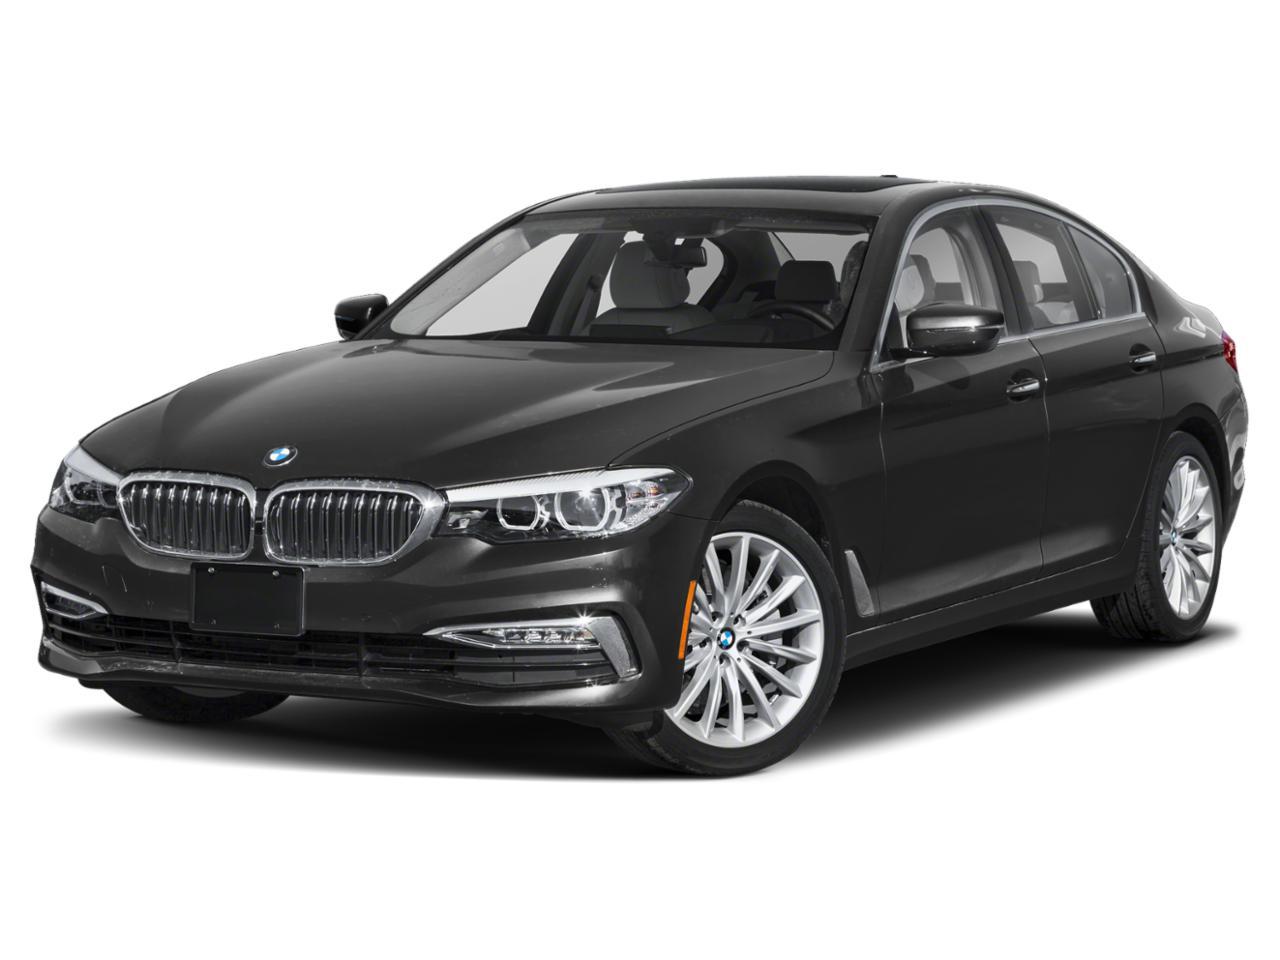 2020 BMW 530i Vehicle Photo in Pleasanton, CA 94588